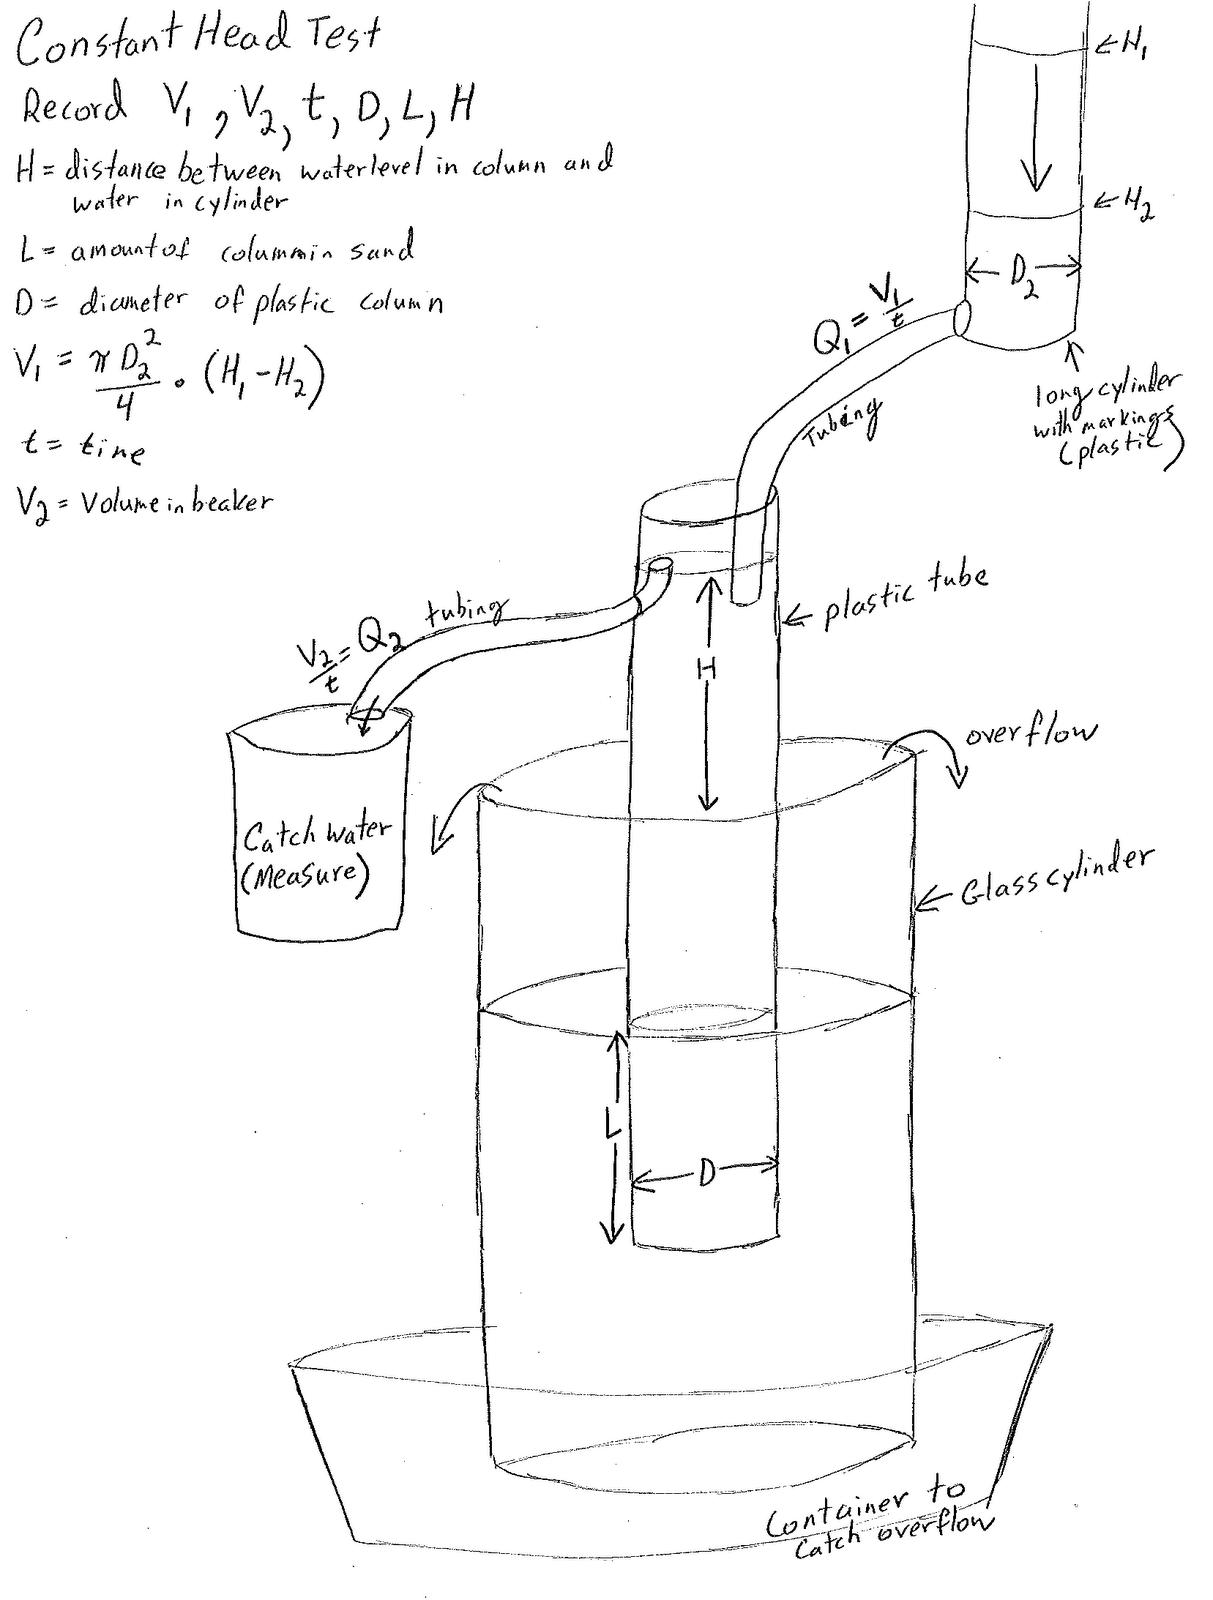 SAU Hydraulic Conductivity 2012: The Constant Head Test